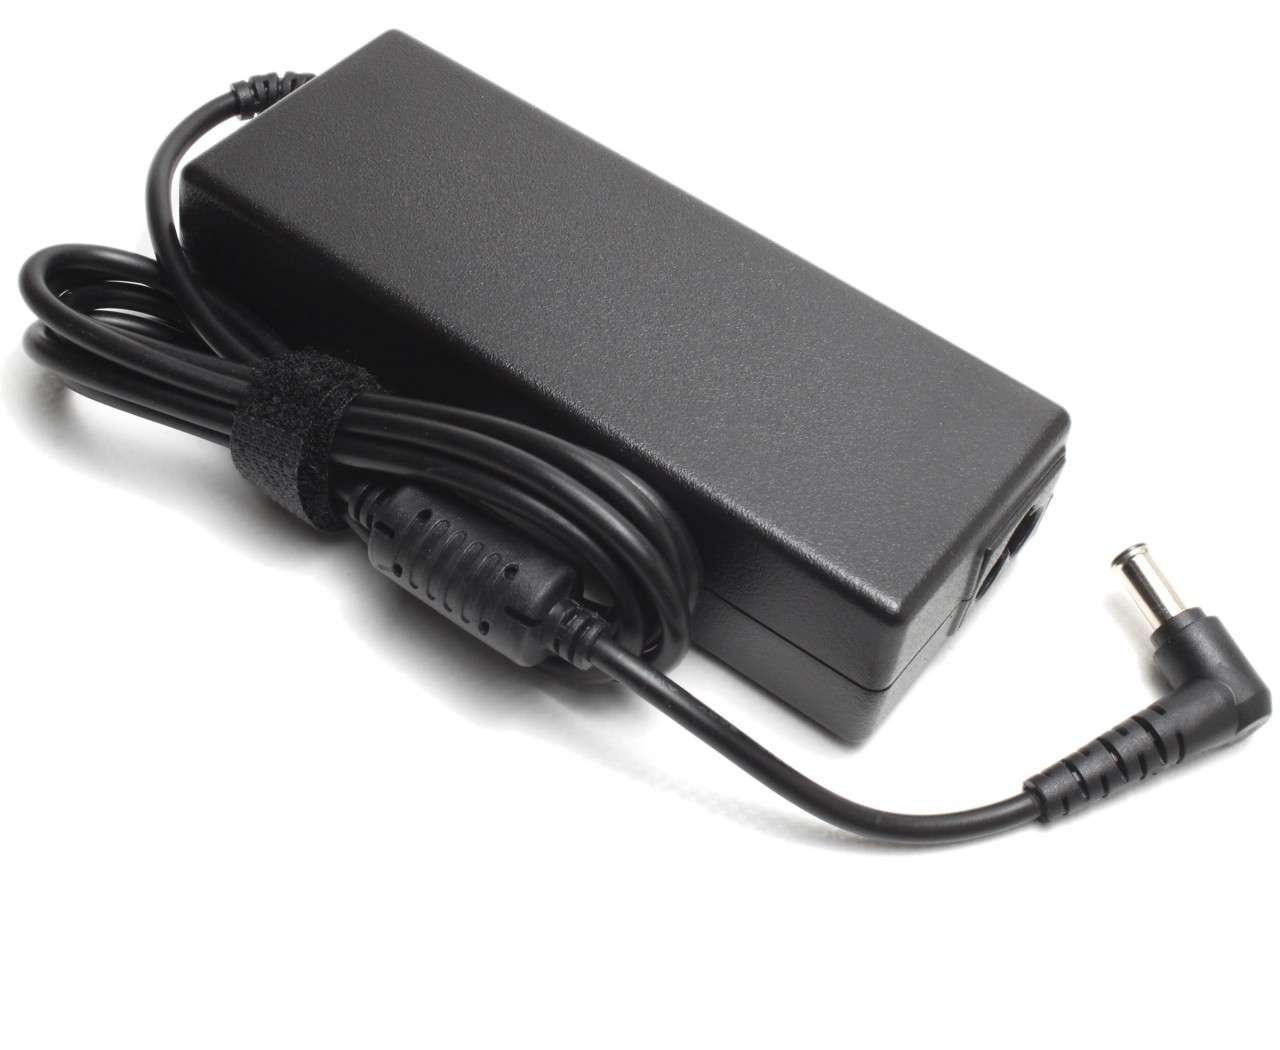 Incarcator Sony Vaio VPCEA24 Replacement imagine powerlaptop.ro 2021